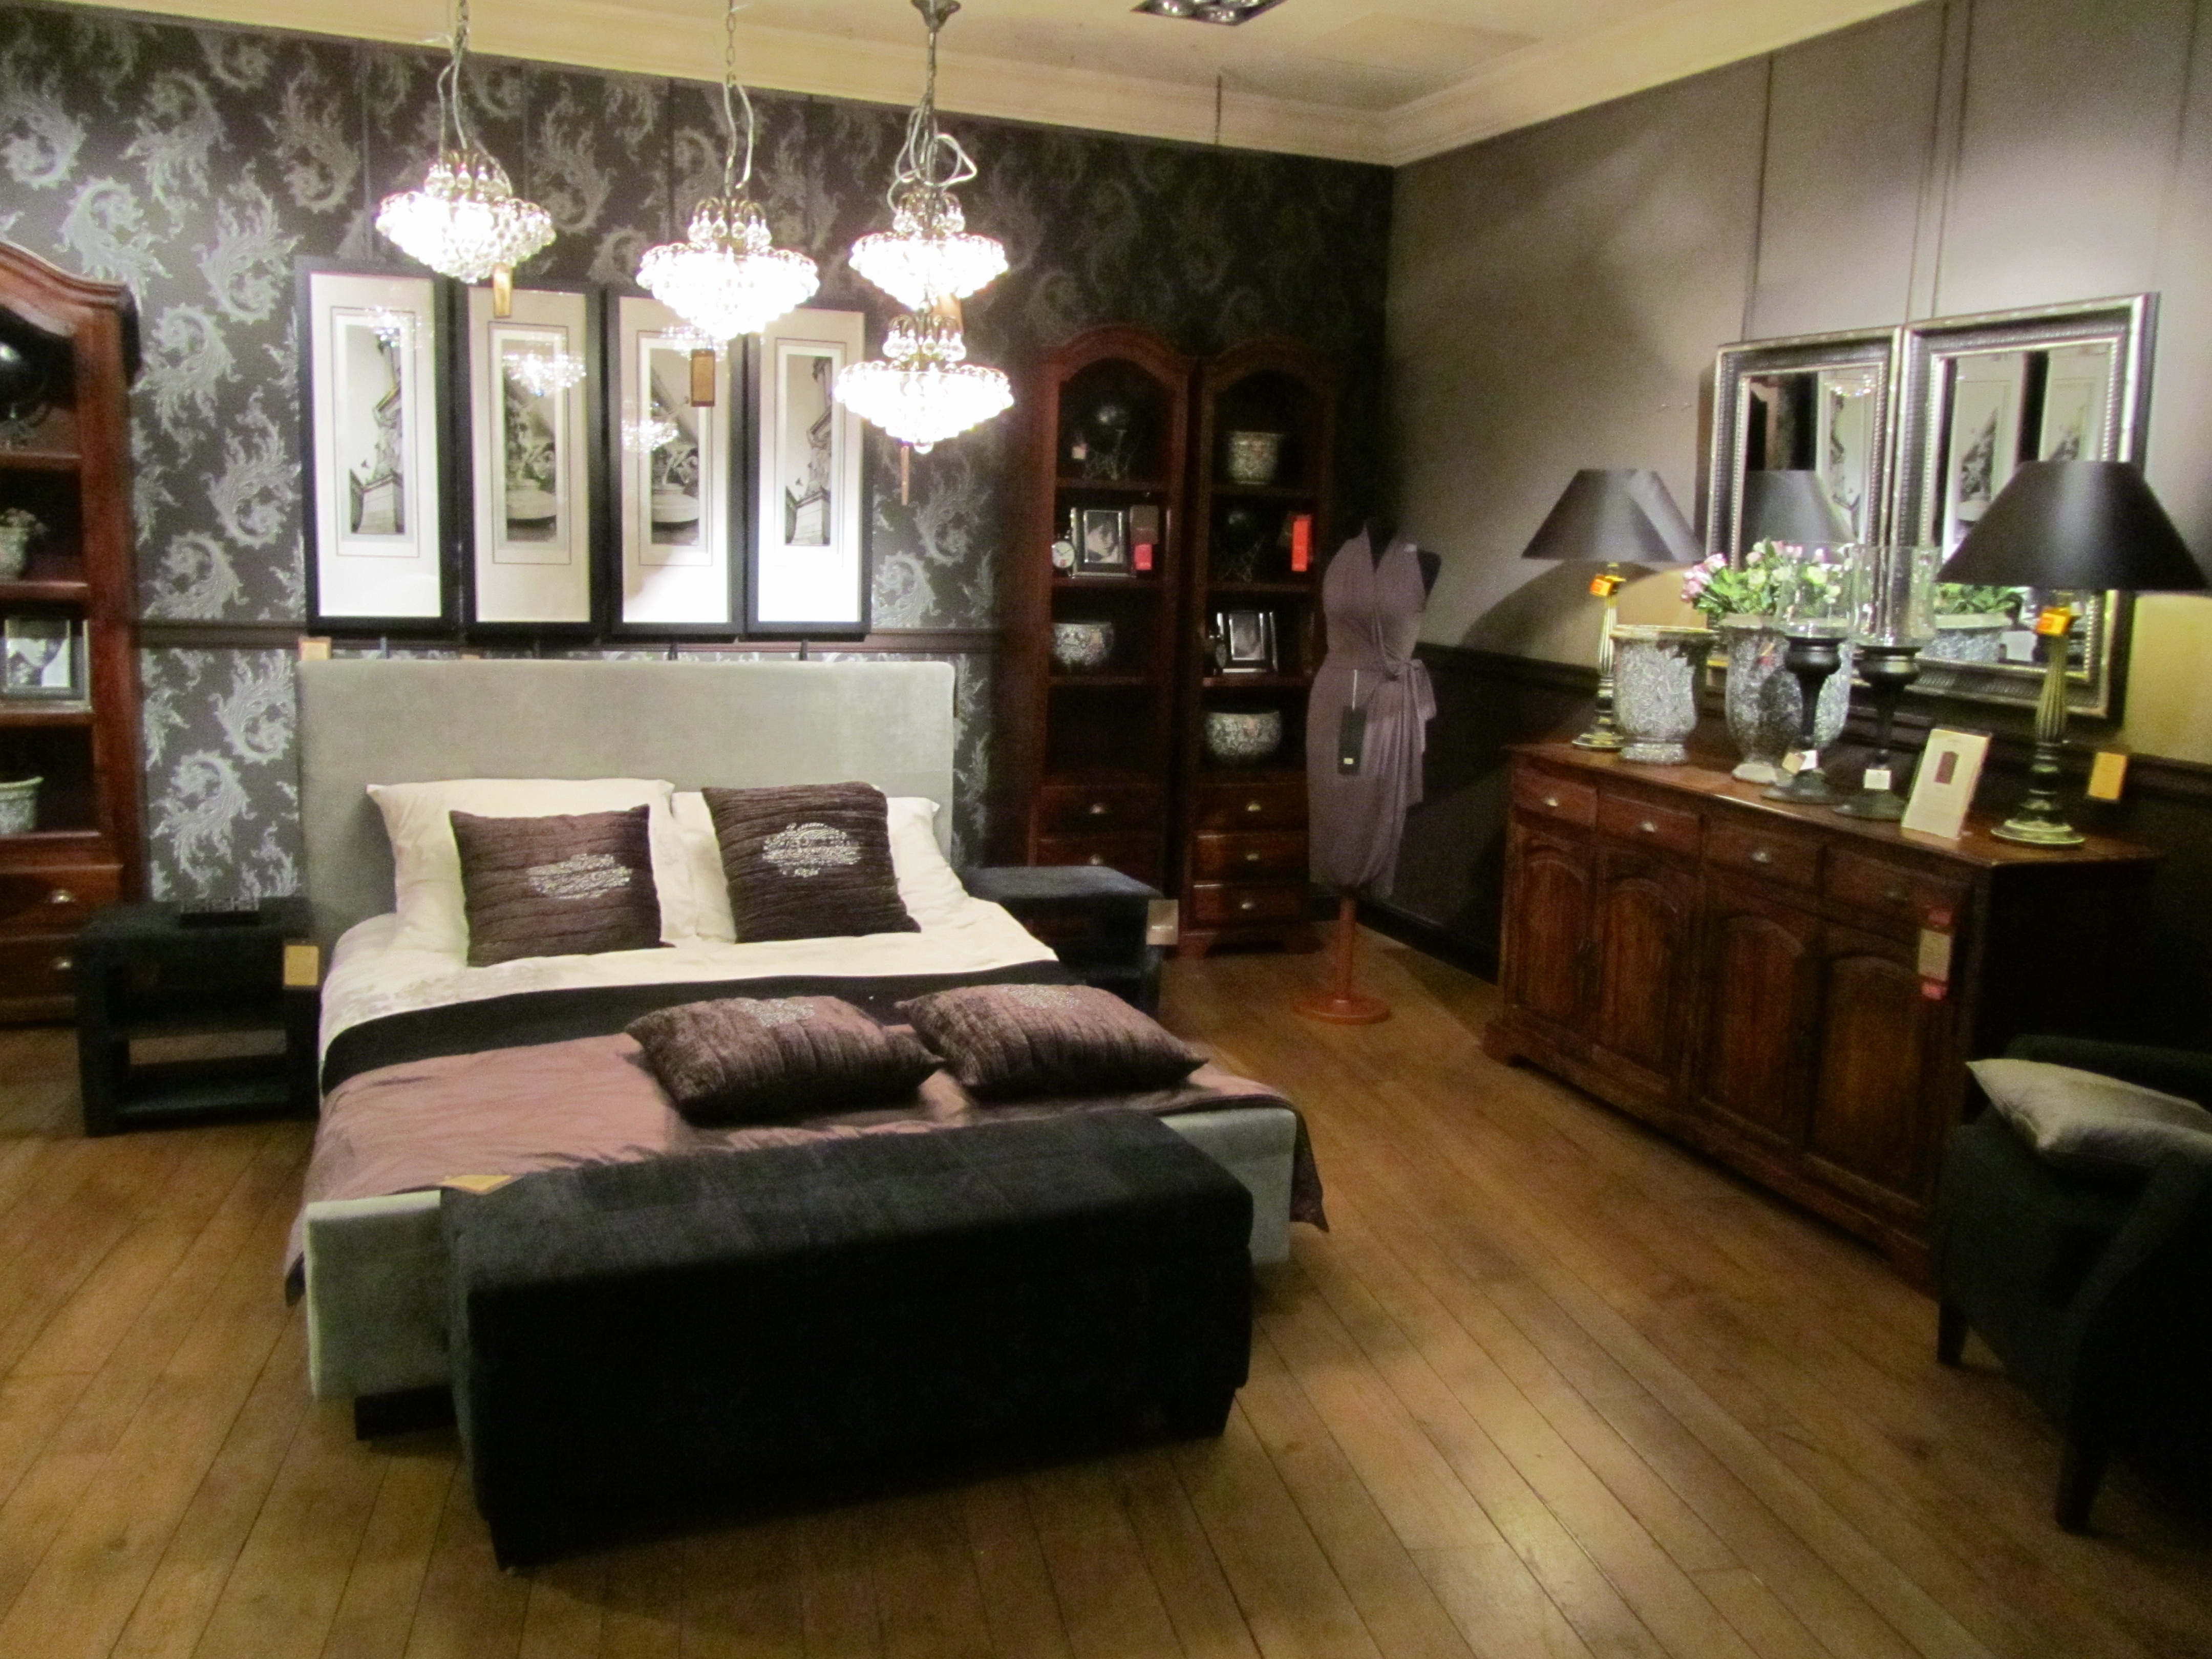 Sensual Bedroom Decor Almi Decor Ewelinas Blog